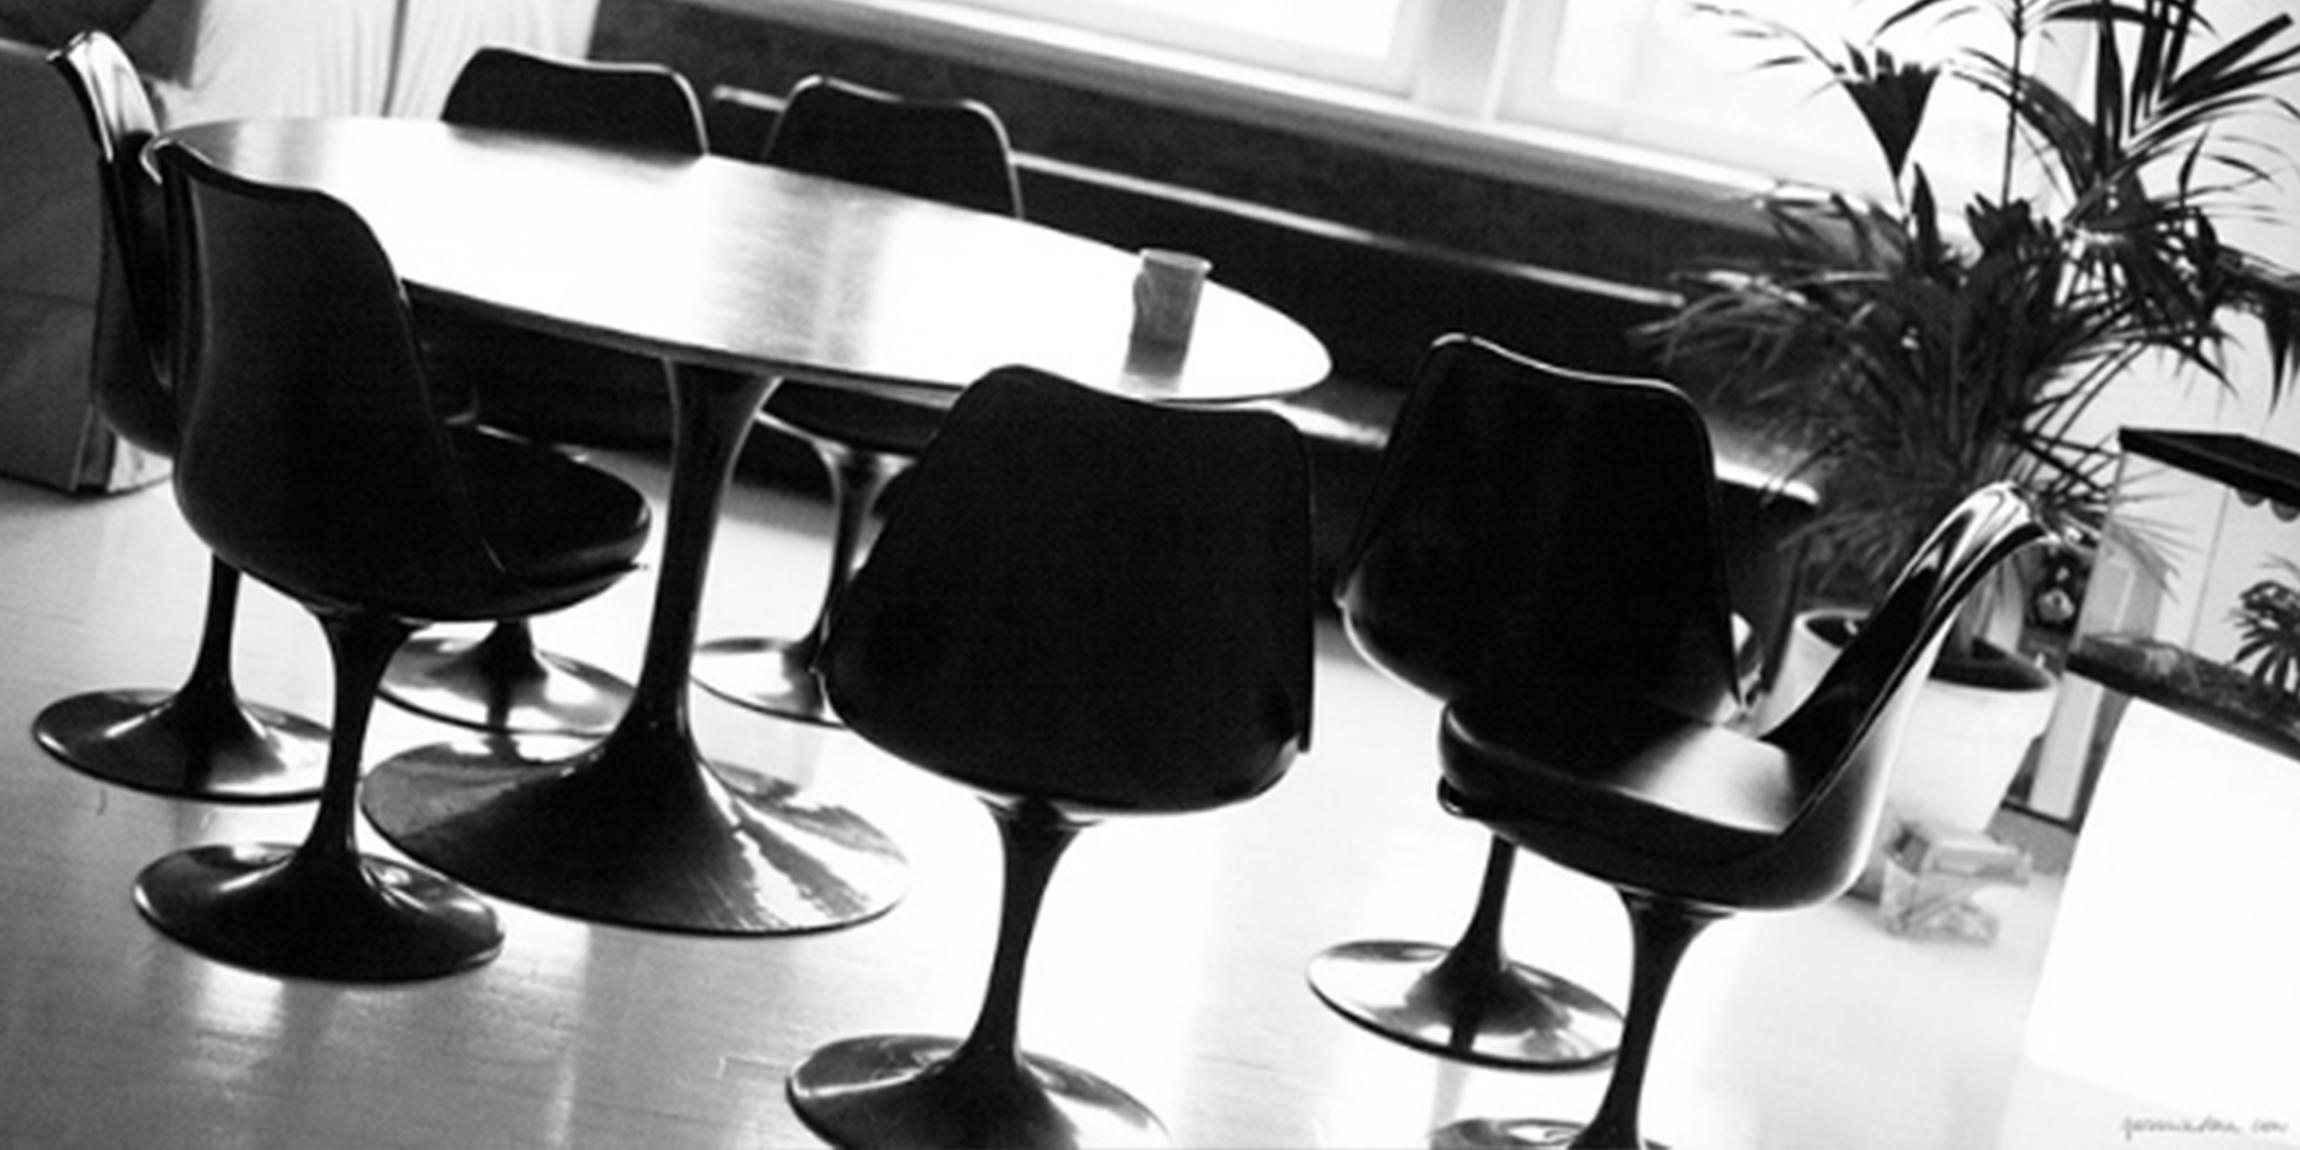 Eero Saarinen Black Tulip Table & Chairs